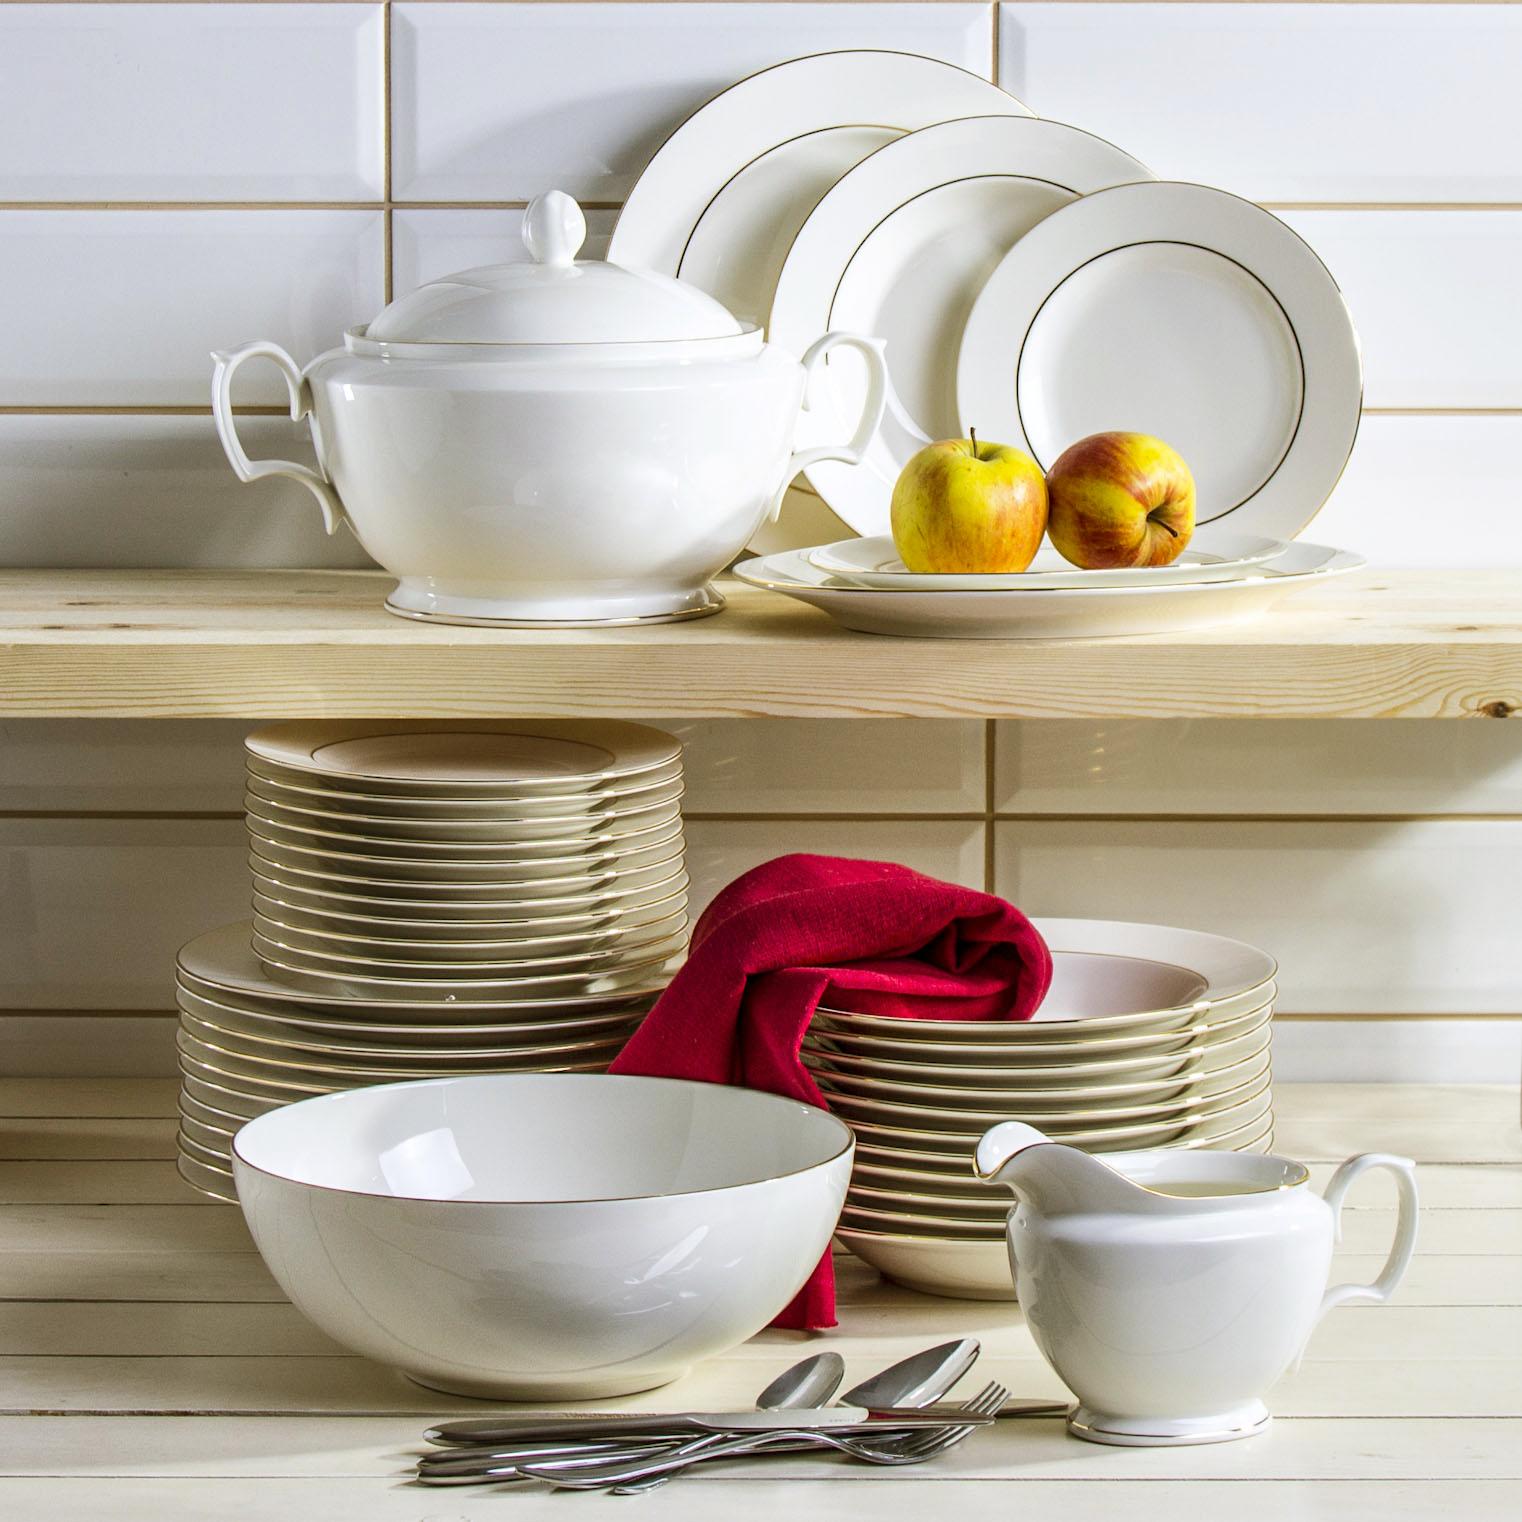 tafelservice 12 personen 41 tlg porzellan geschirr set kombiservice ecru ebay. Black Bedroom Furniture Sets. Home Design Ideas